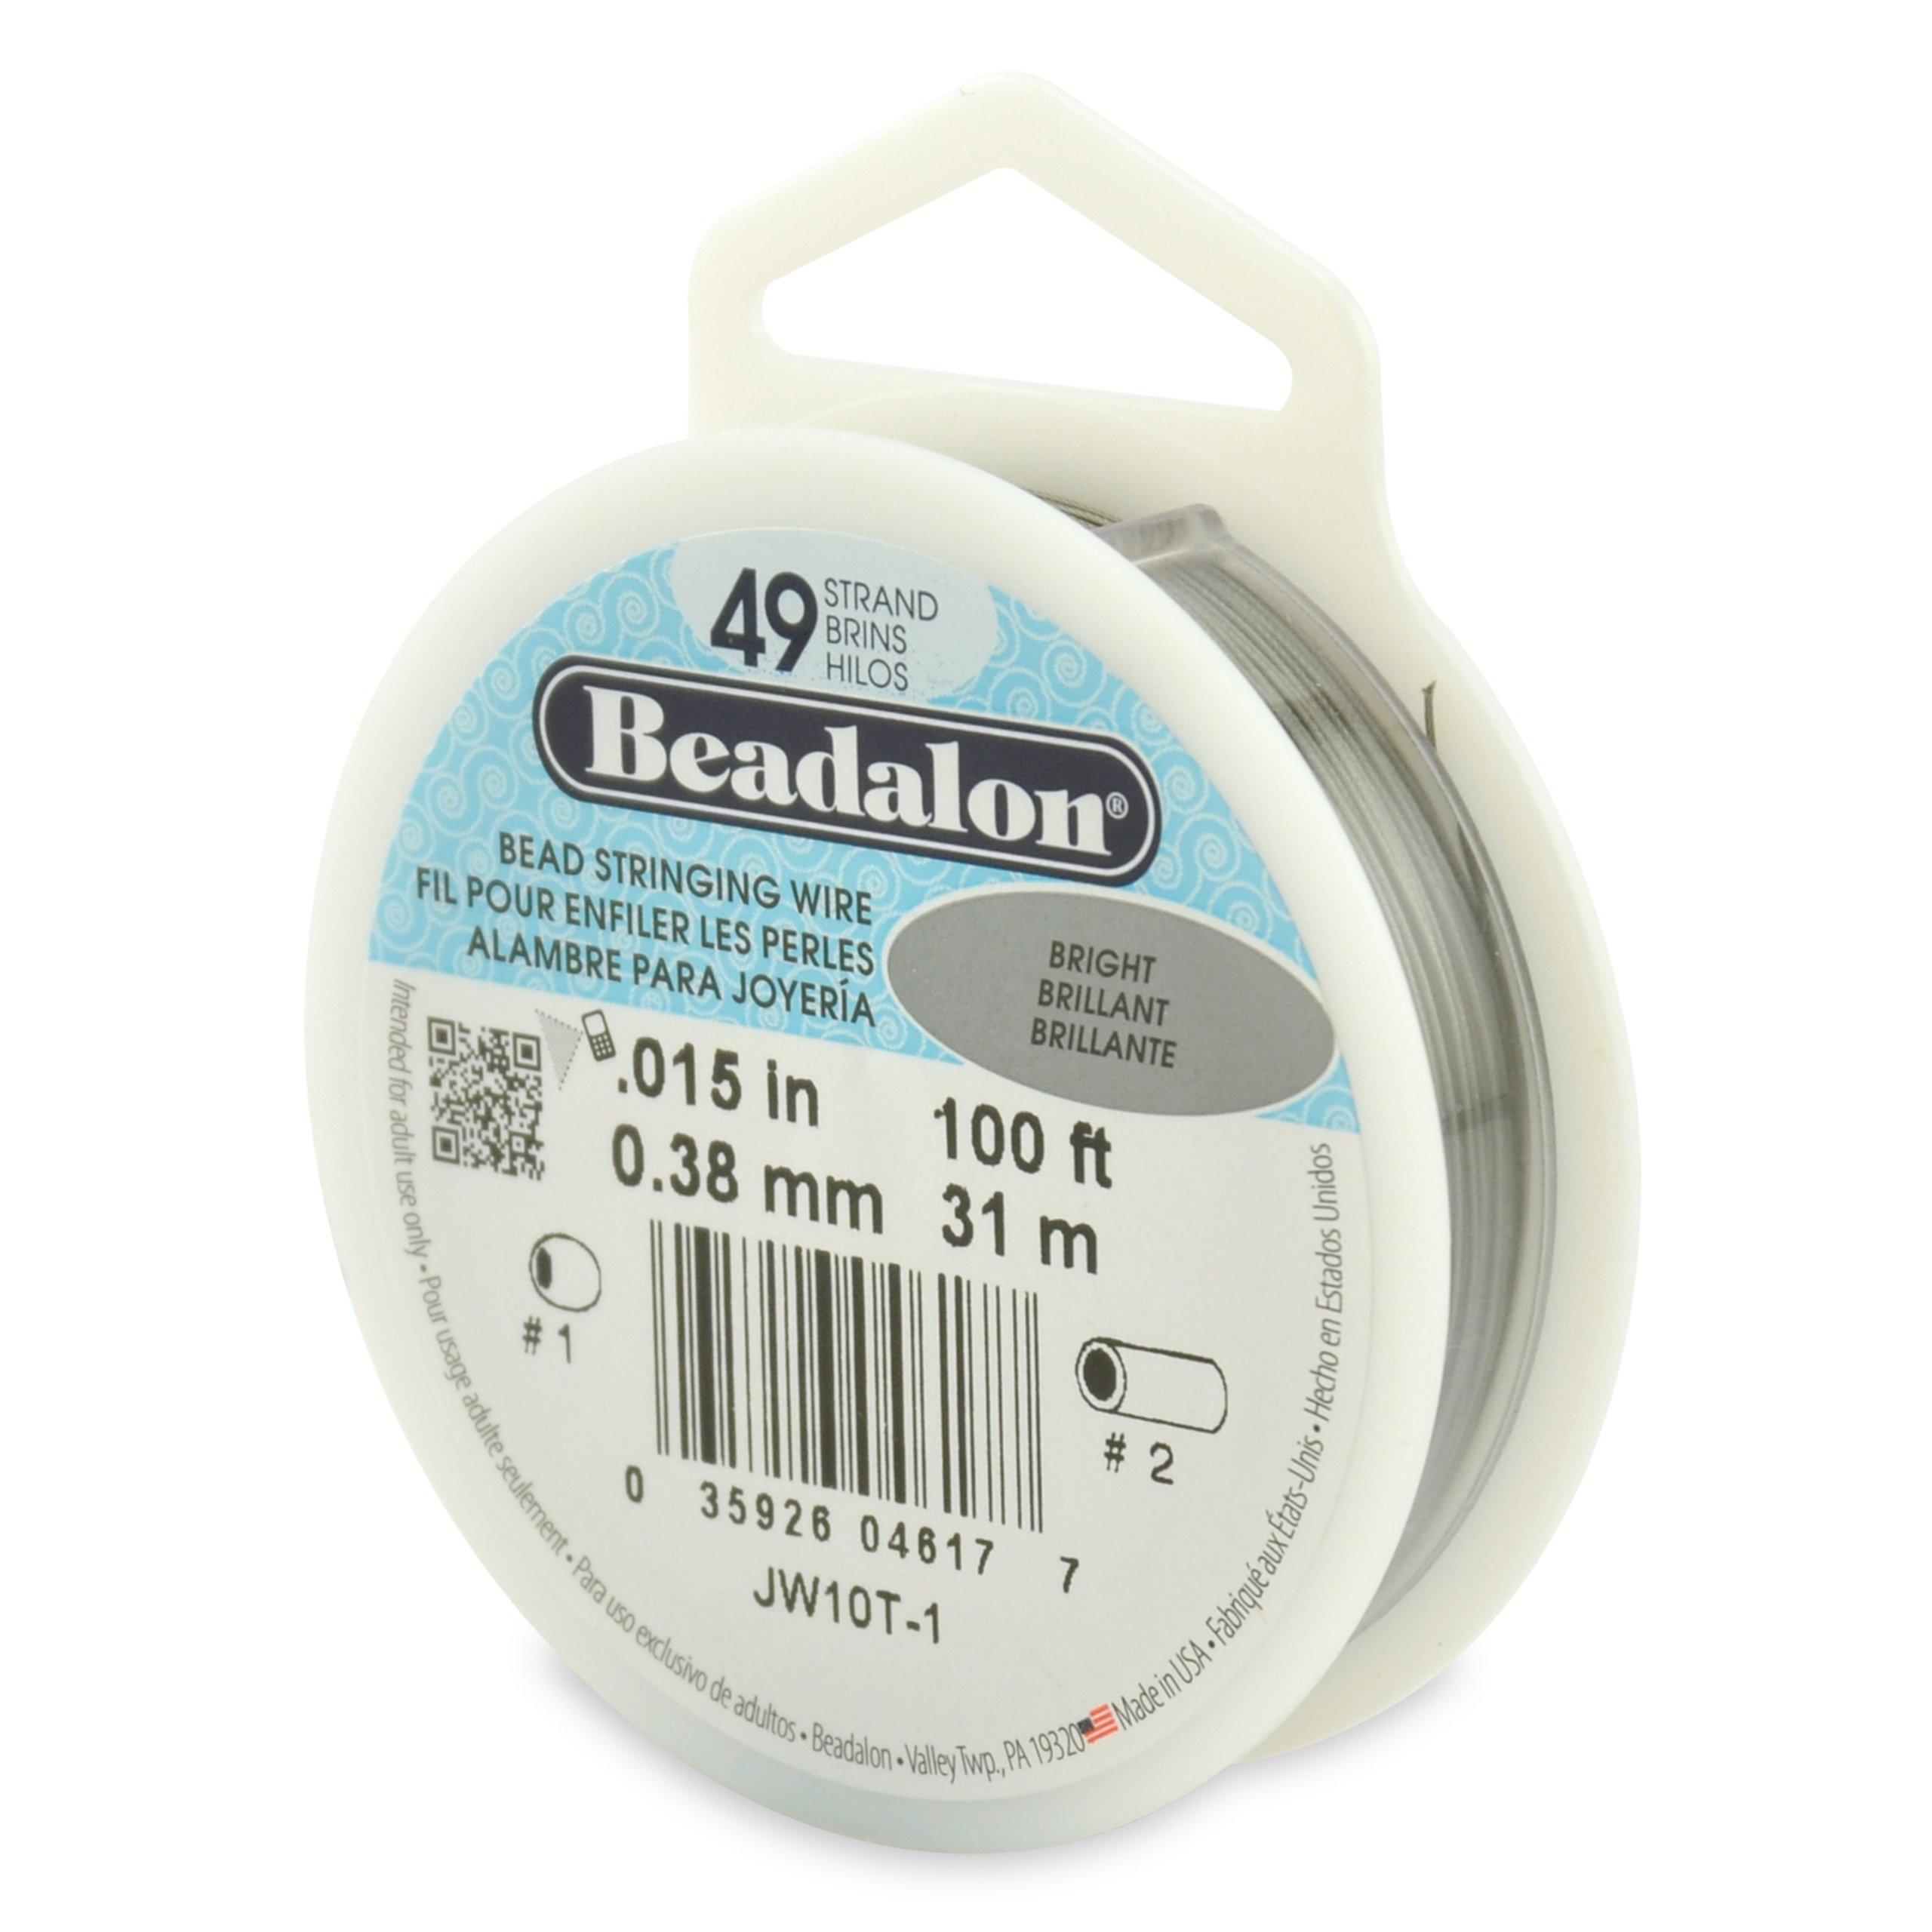 Beadalon 49-Strand 0.015'' (0.38 mm) 100 ft (30.5 m) Bright Bead Stringing Wire by Beadalon